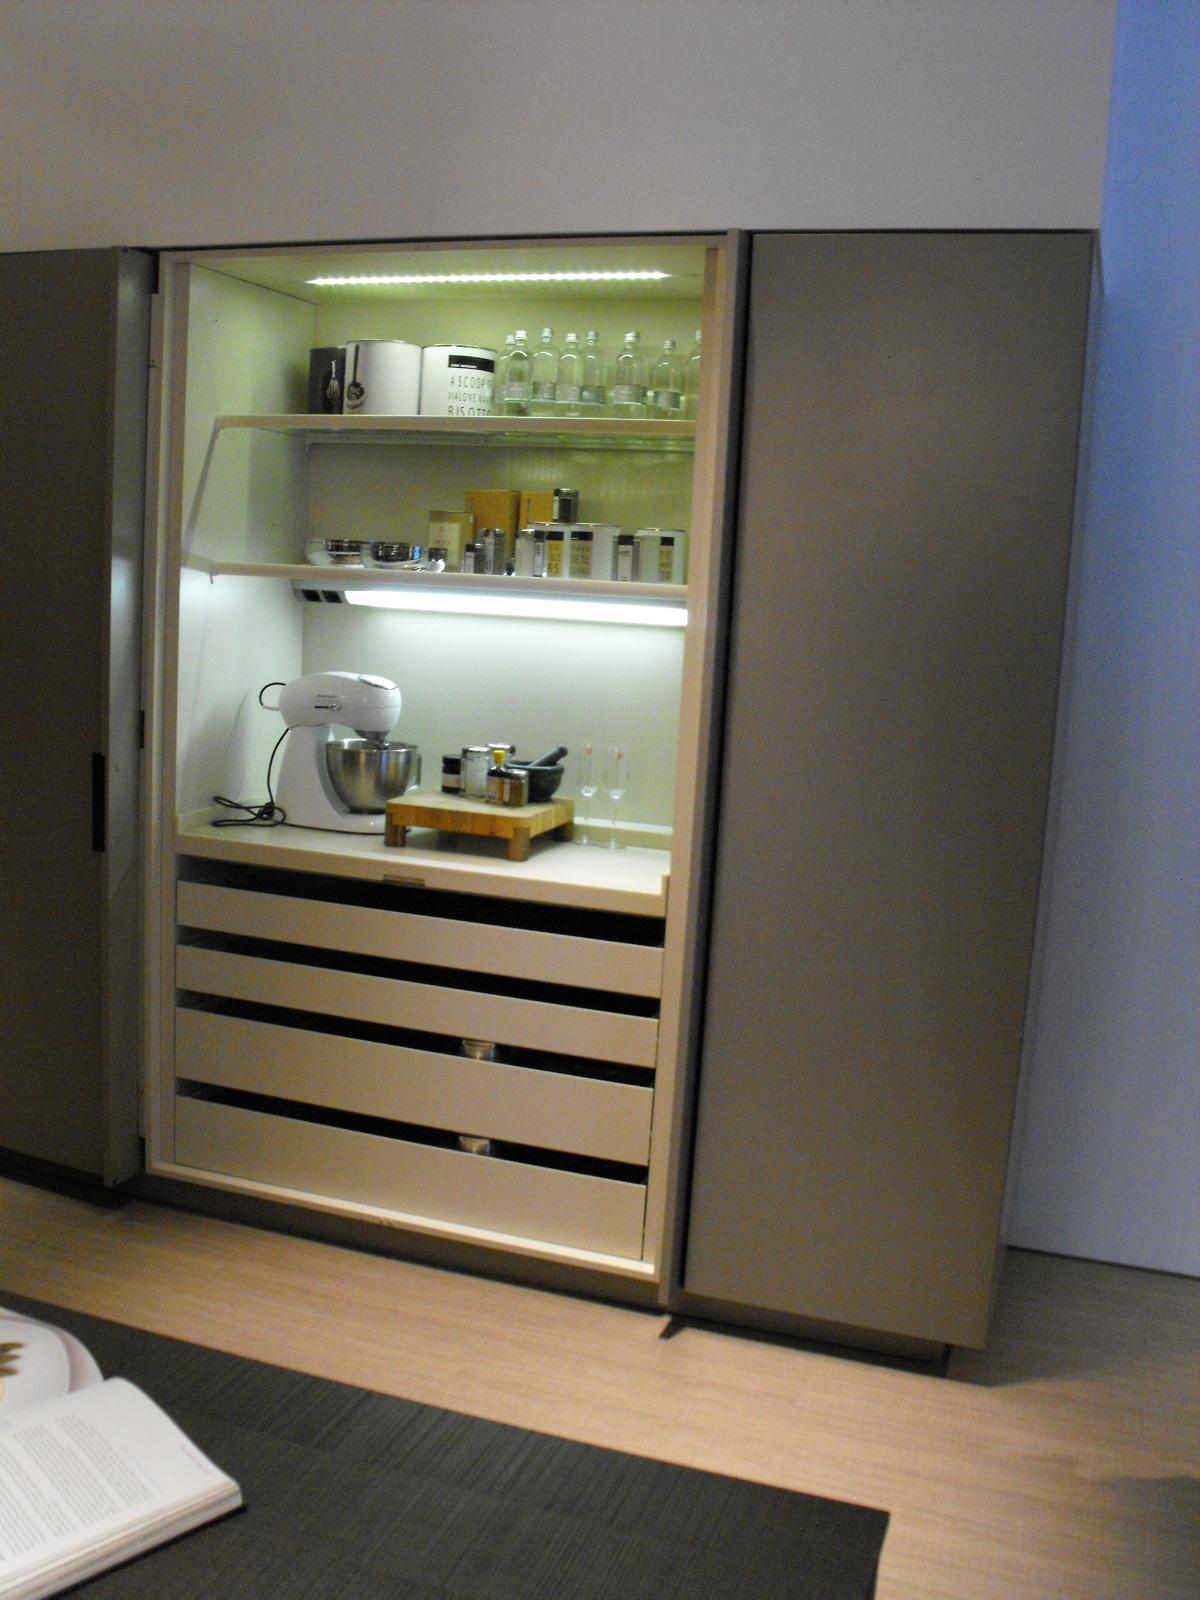 Salone del mobile milano domus mobili for Domus mobili